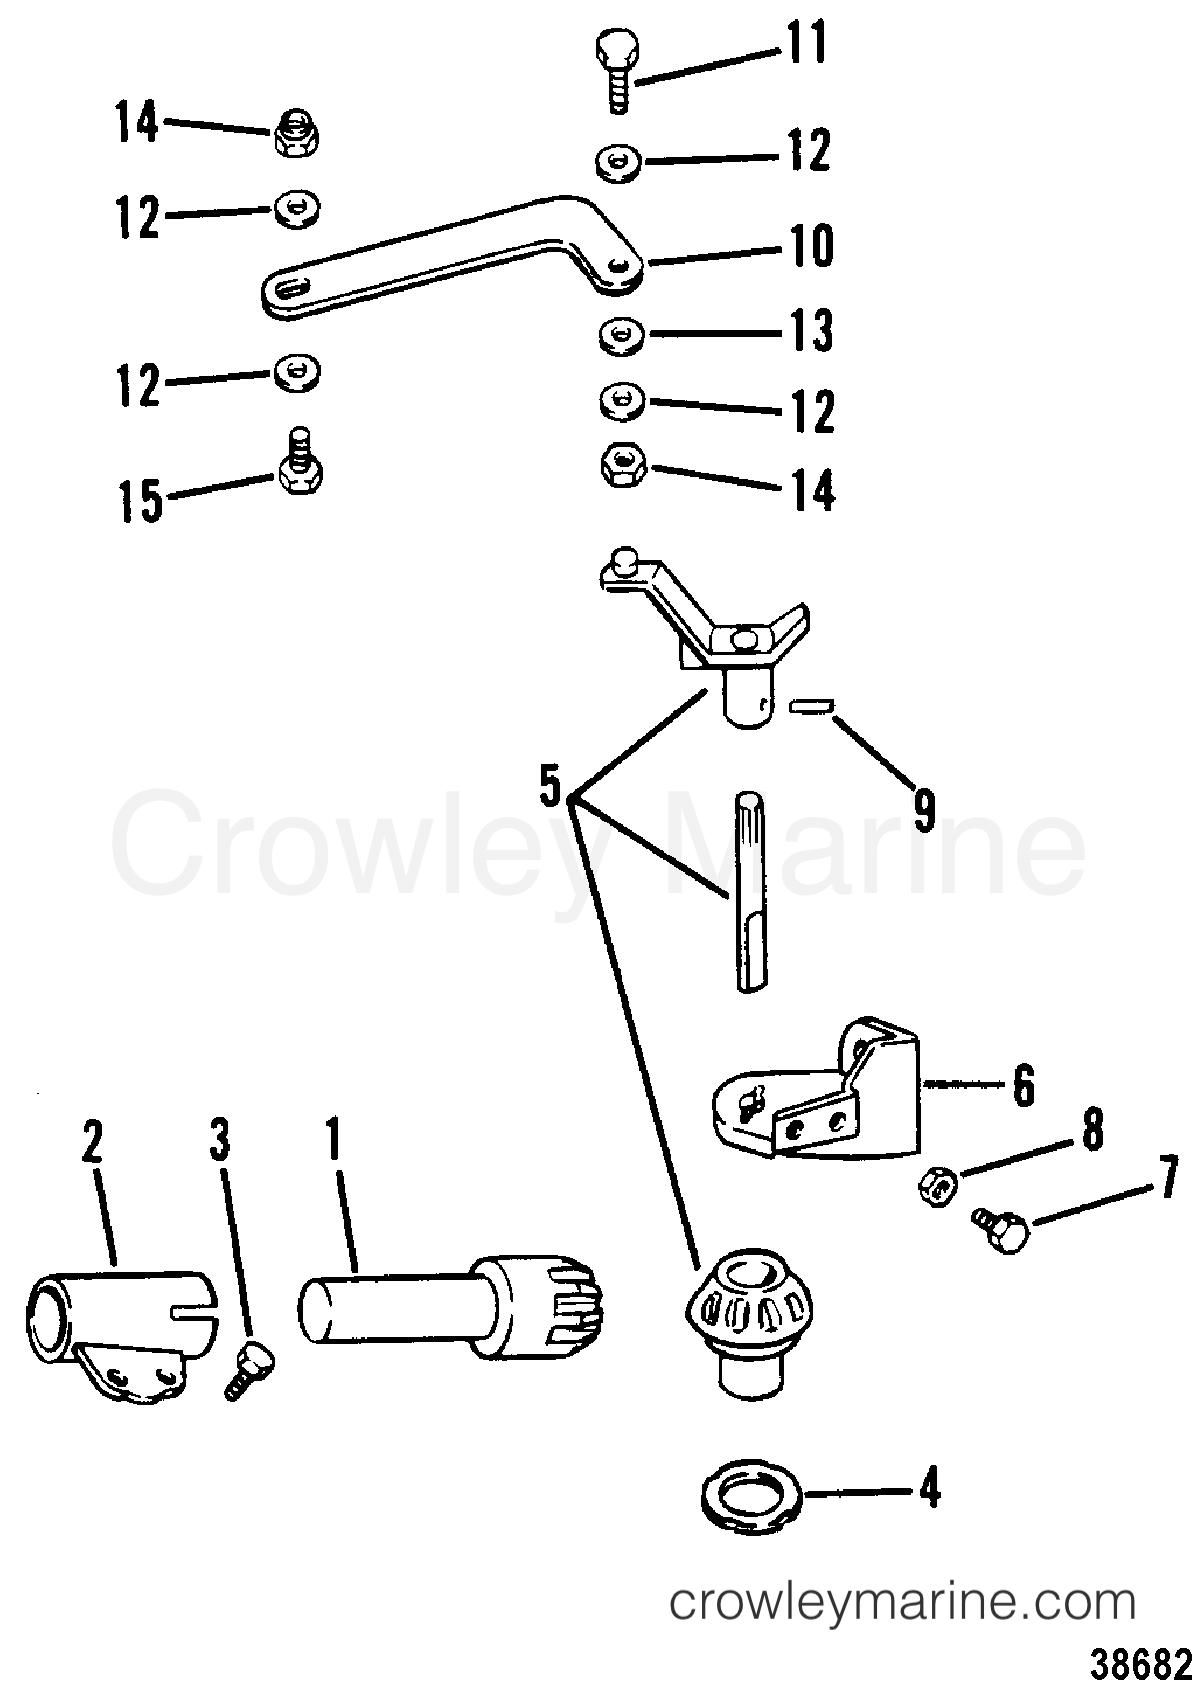 5AdrSKop 2013 150 hp etec wiring diagram wiring schematics u2022 couponss Evinrude Wiring Diagram at readyjetset.co